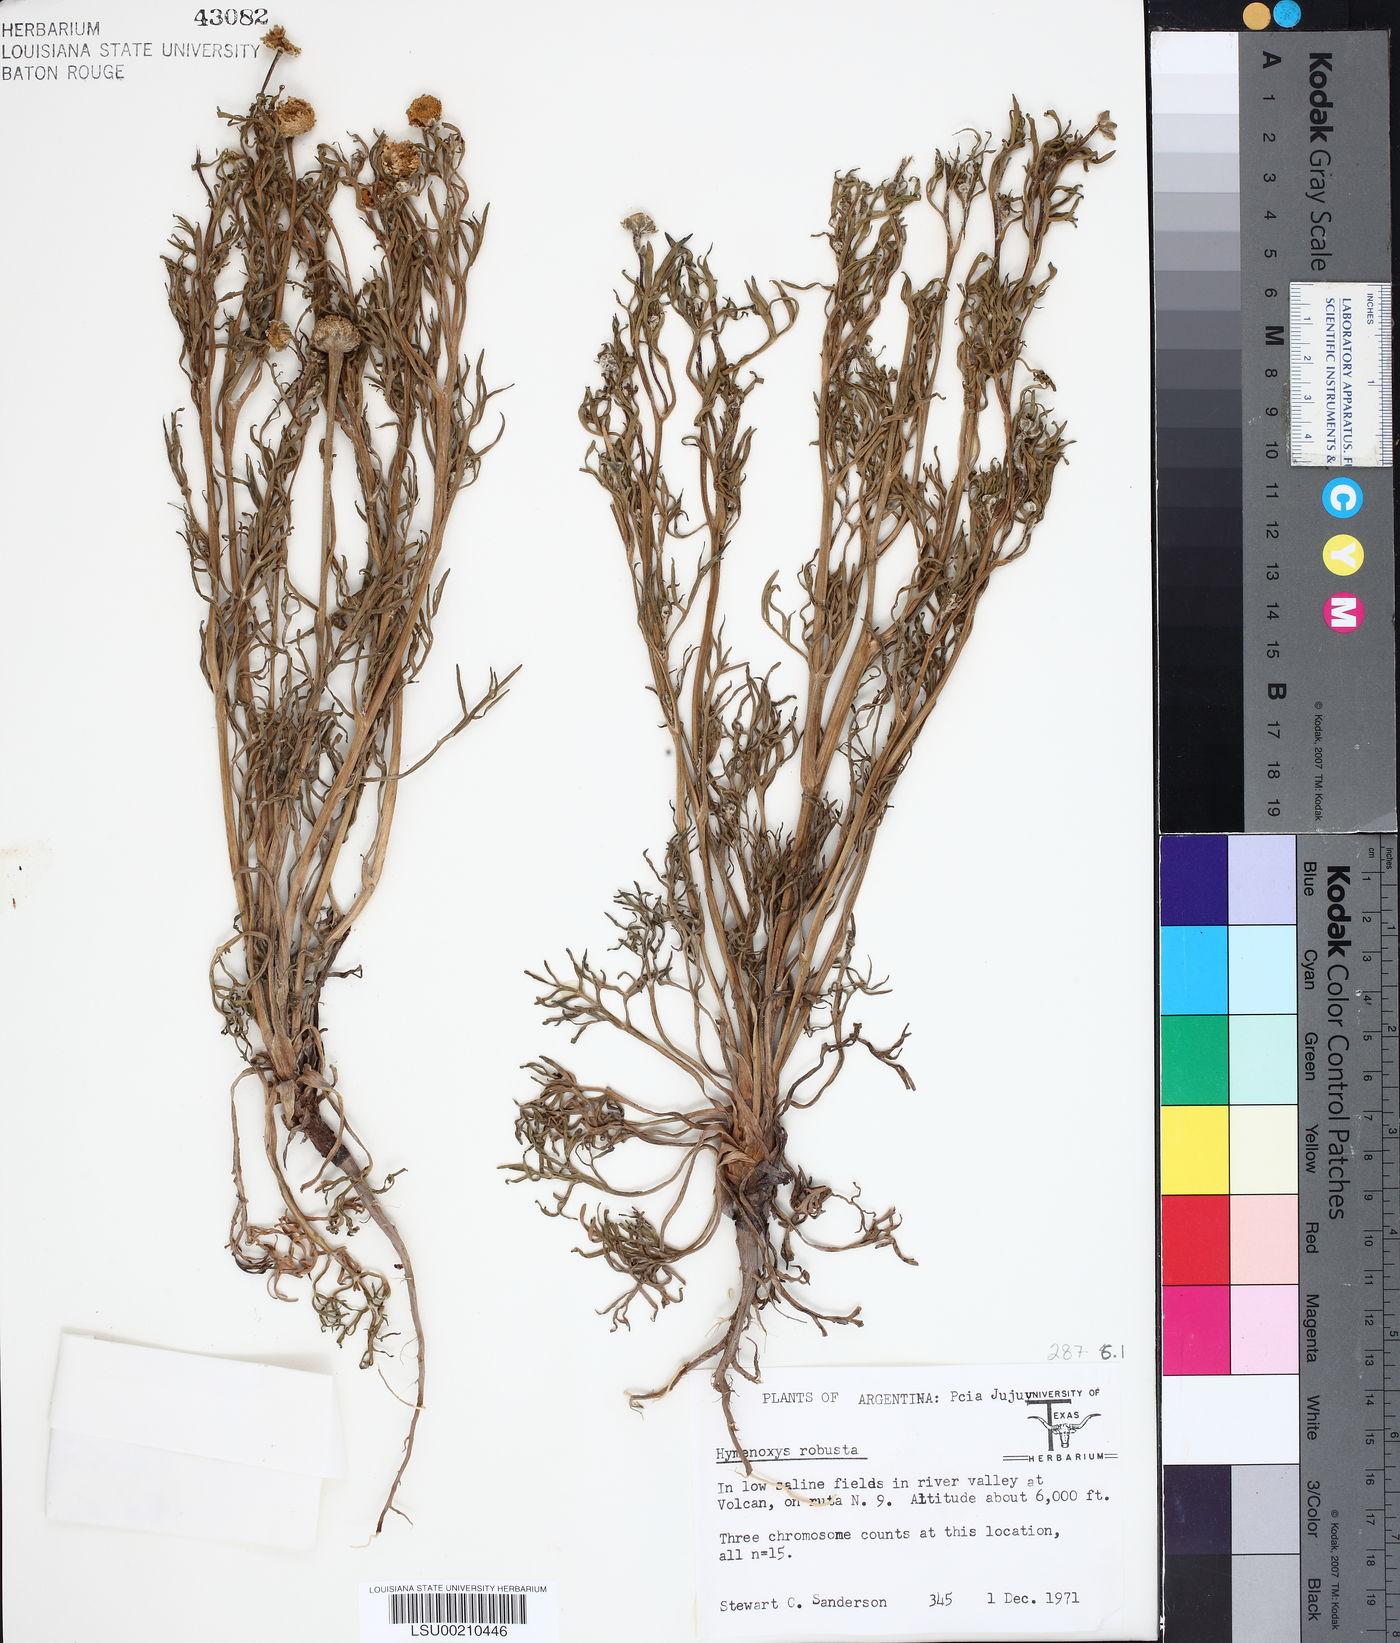 Hymenoxys robusta image